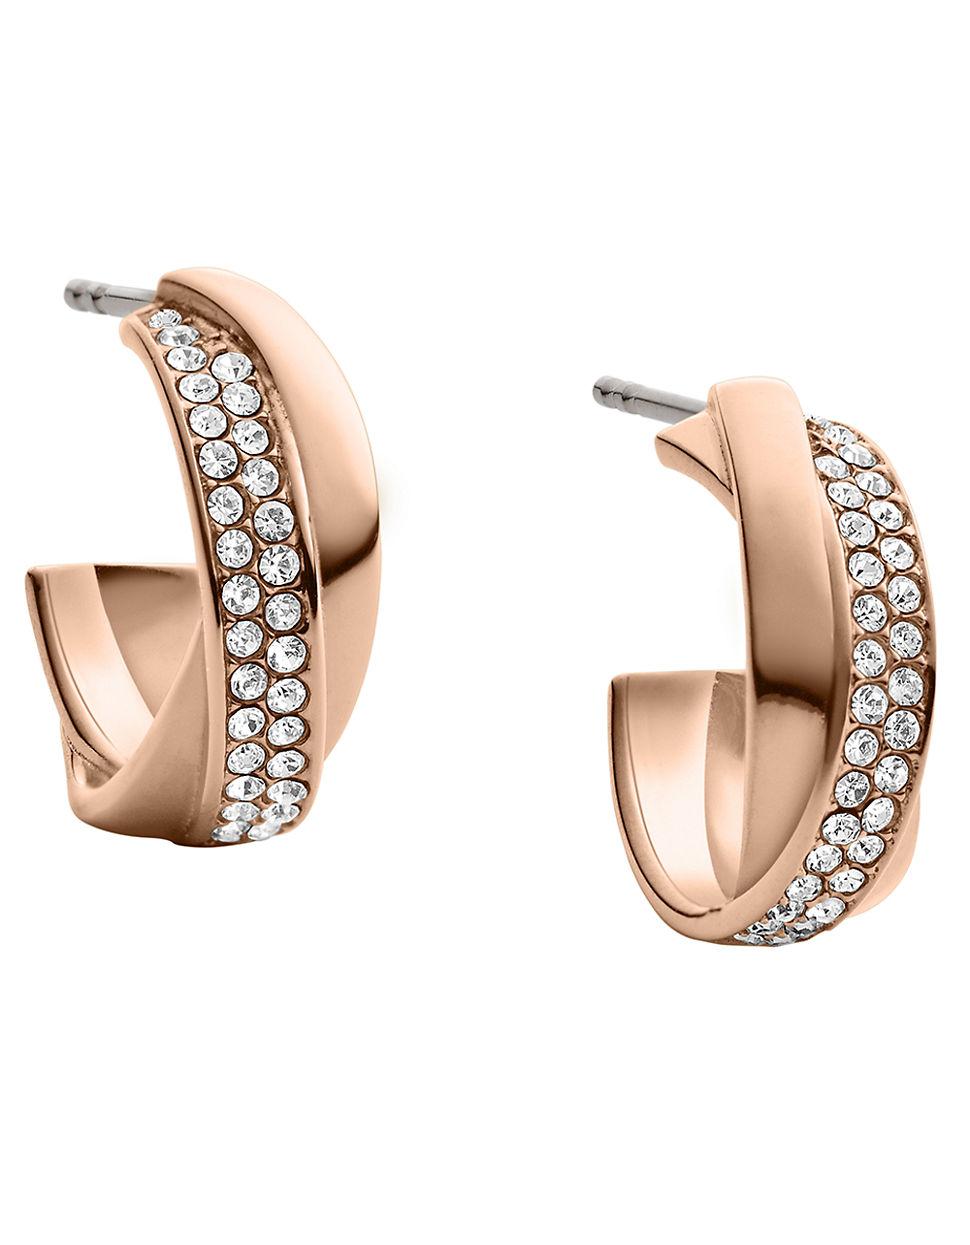 michael kors rose gold earrings gallery jewelry design. Black Bedroom Furniture Sets. Home Design Ideas